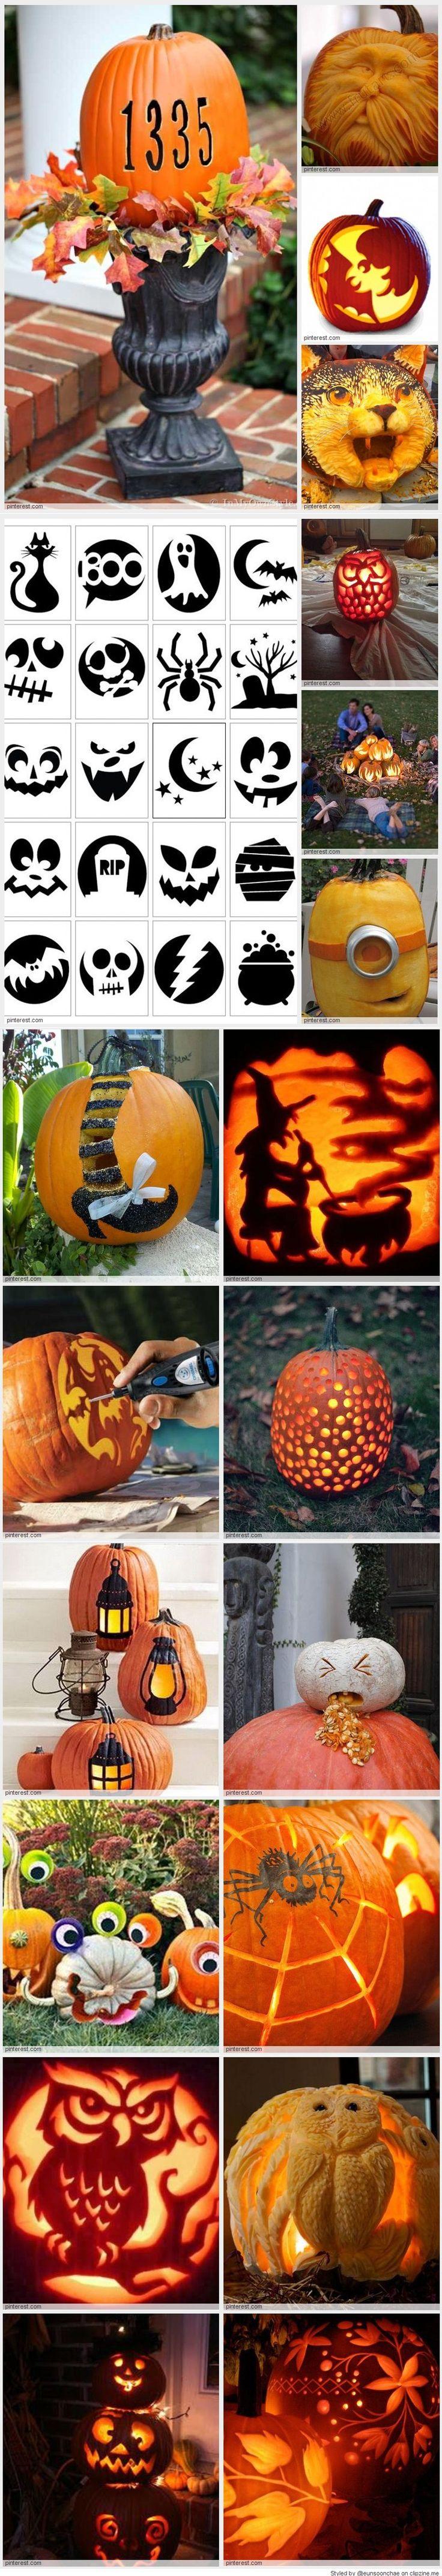 57 best pumpkin patterns images on pinterest pumpkin carvings